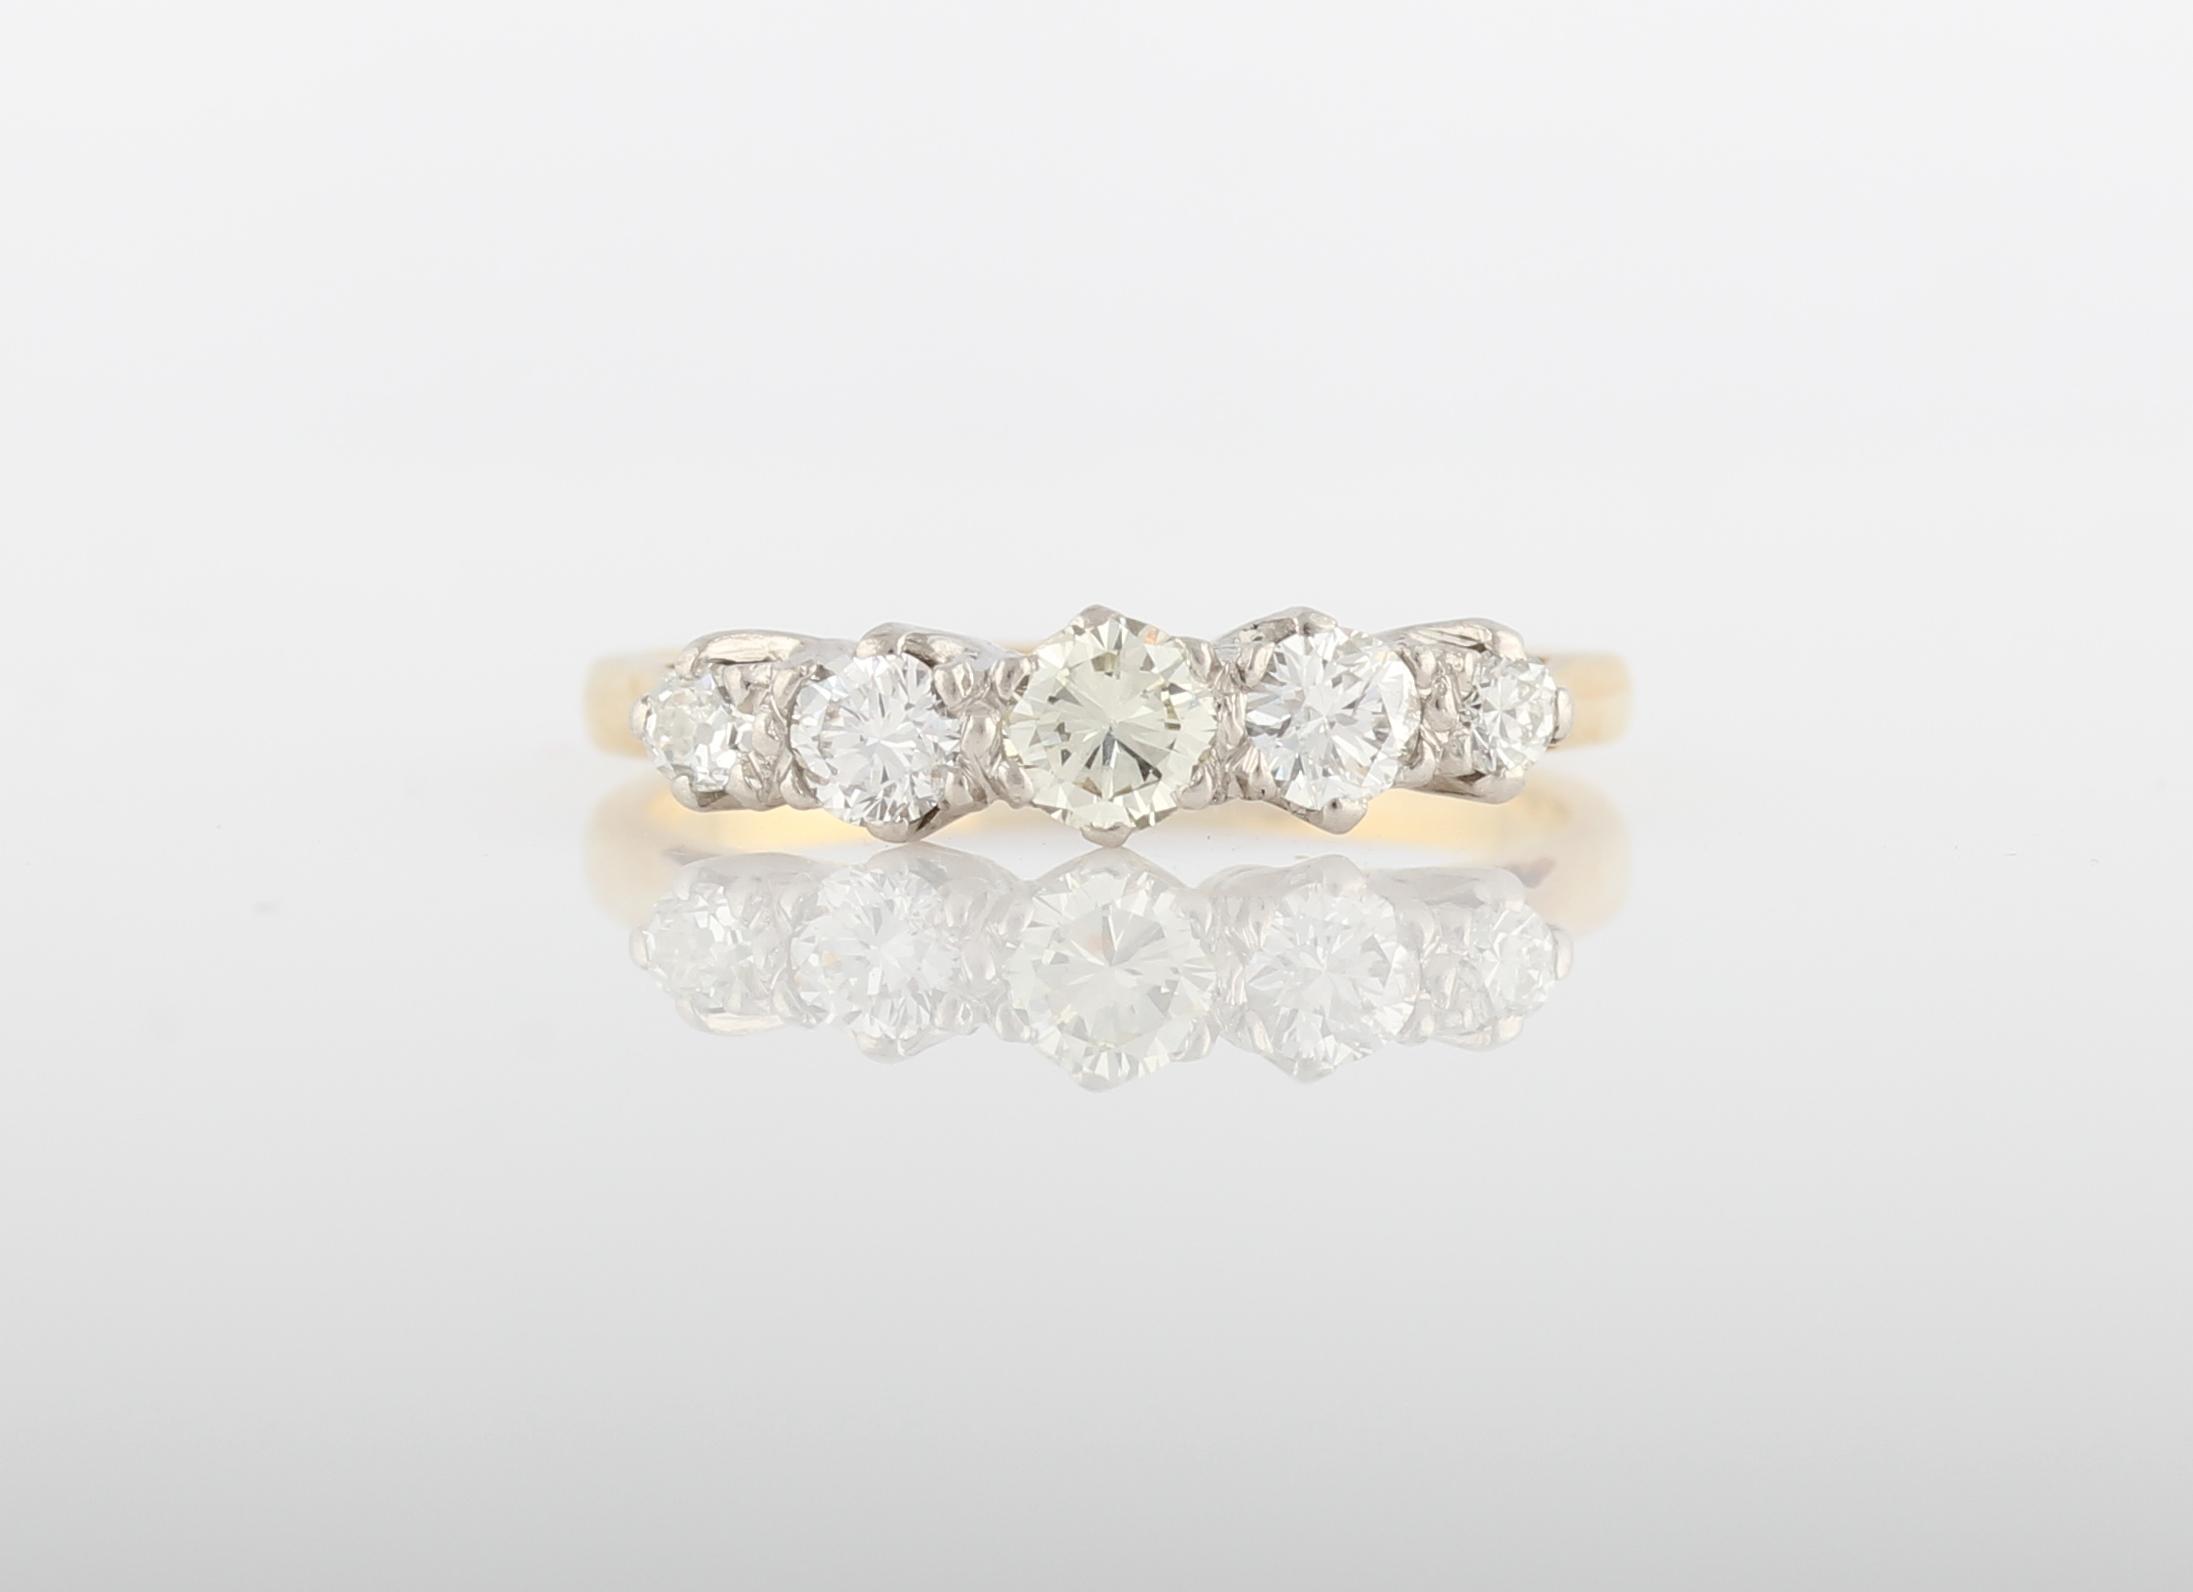 Lot 4 - A five stone diamond ring, set with five graduated round brilliant cut diamonds, total diamond